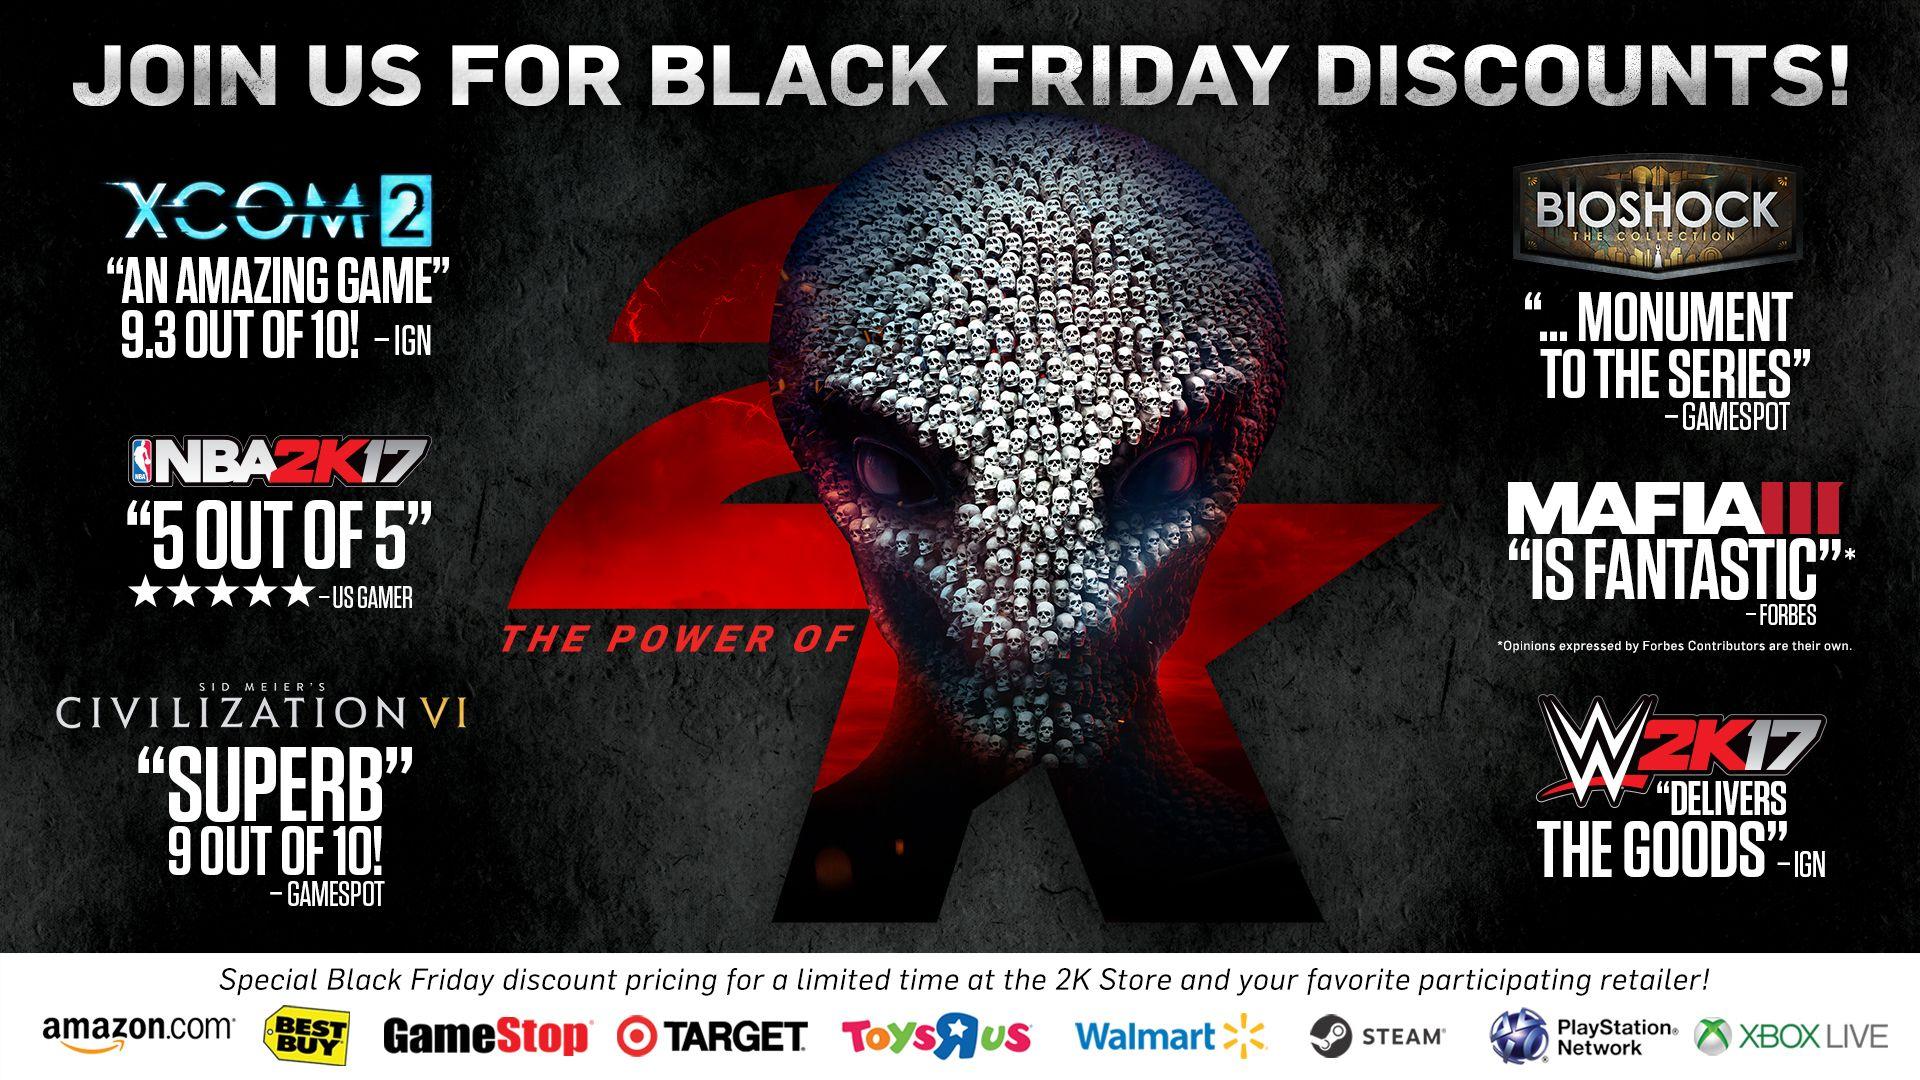 Black Friday Weekend Deals From 2K! - 2K